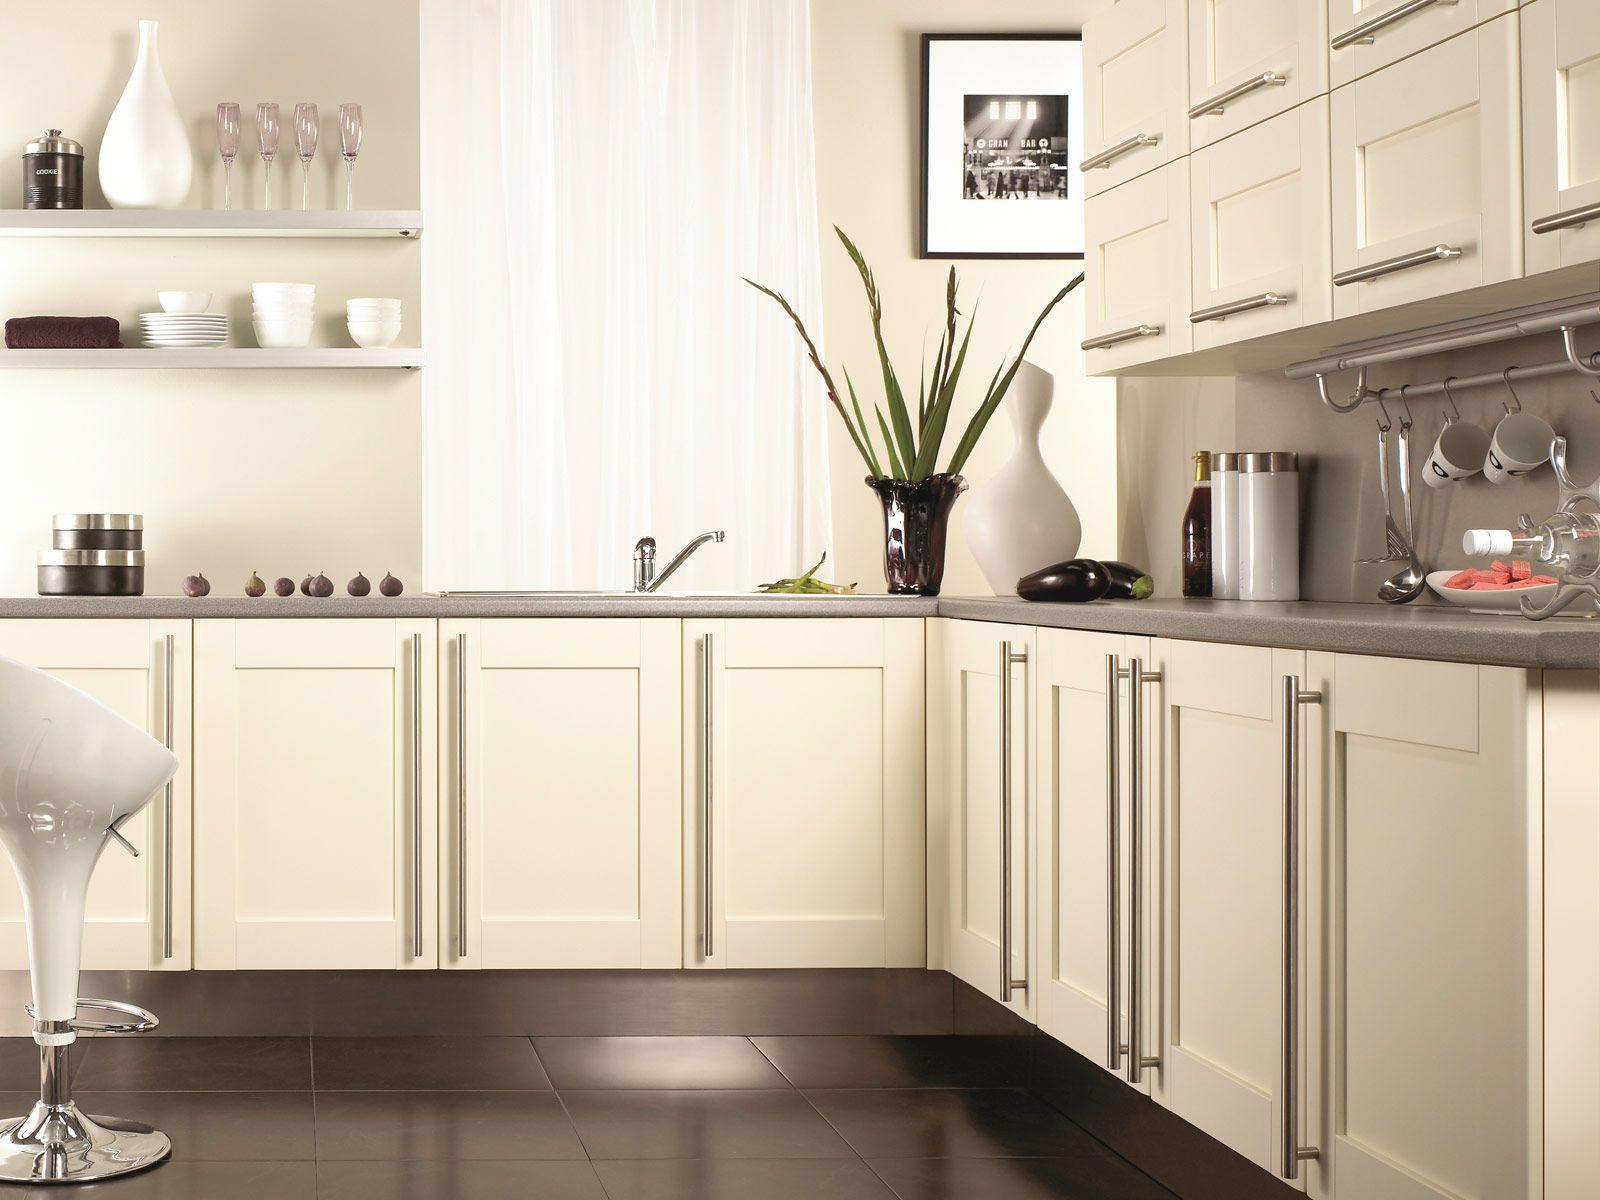 IKEA NZ Ikea Kitchen From Nordicdesignconz Online Store